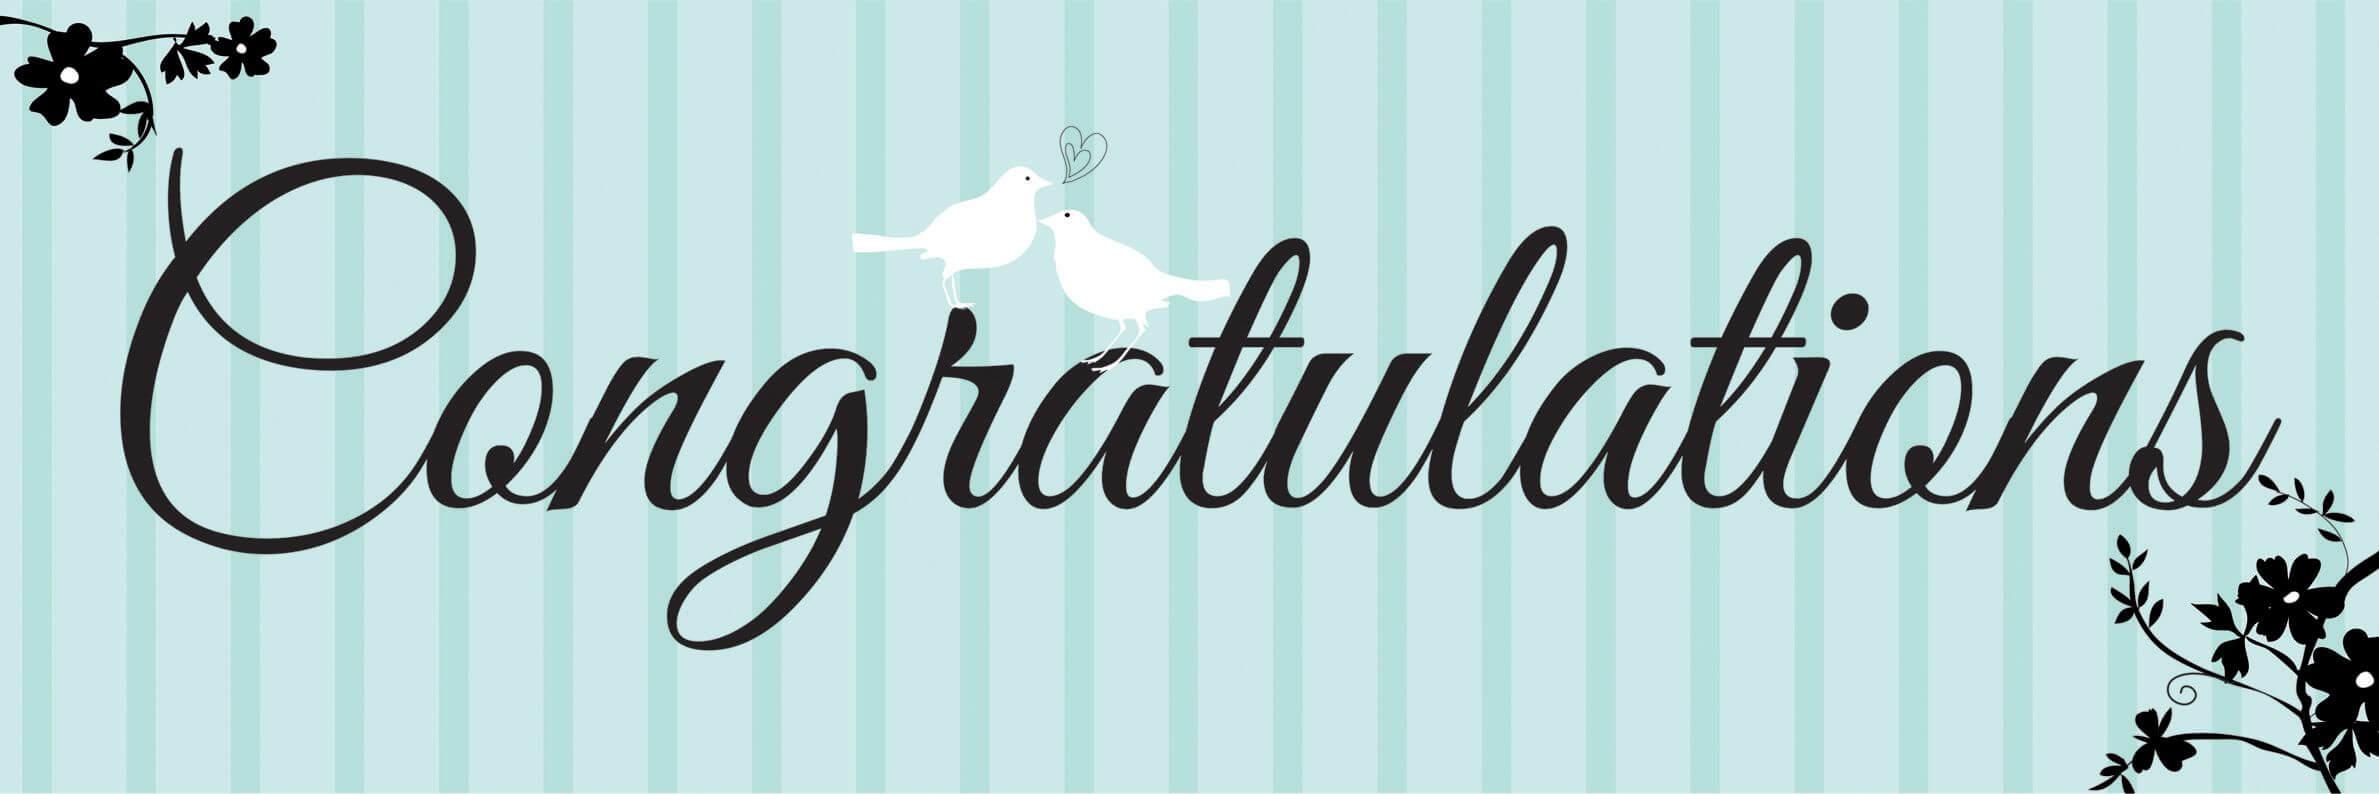 Congratulations Banner Template | Birthday Card Printable Throughout Congratulations Banner Template